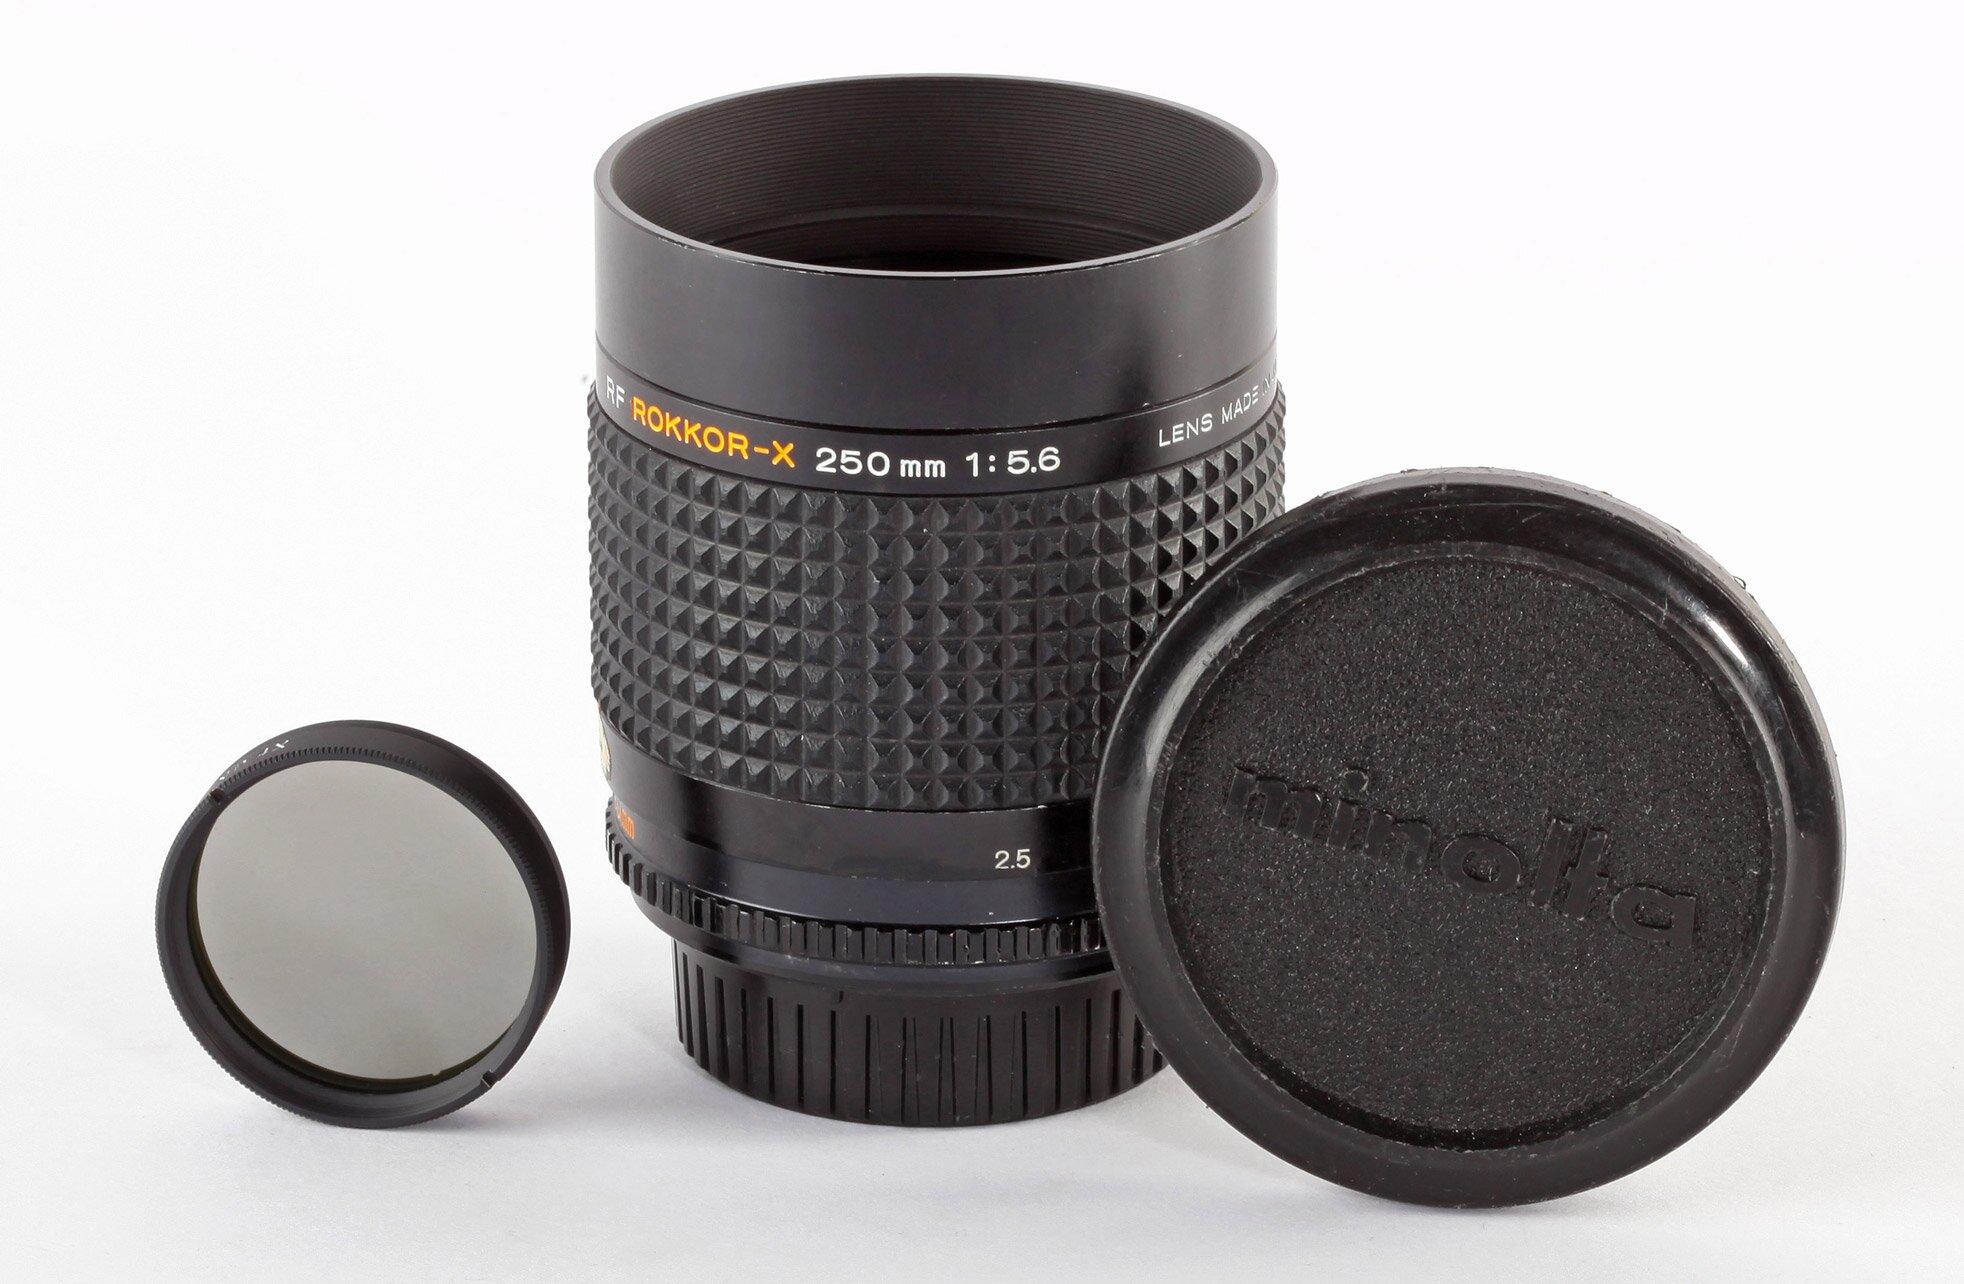 Minolta RF Rokkor-X 250mm/5,6 Set